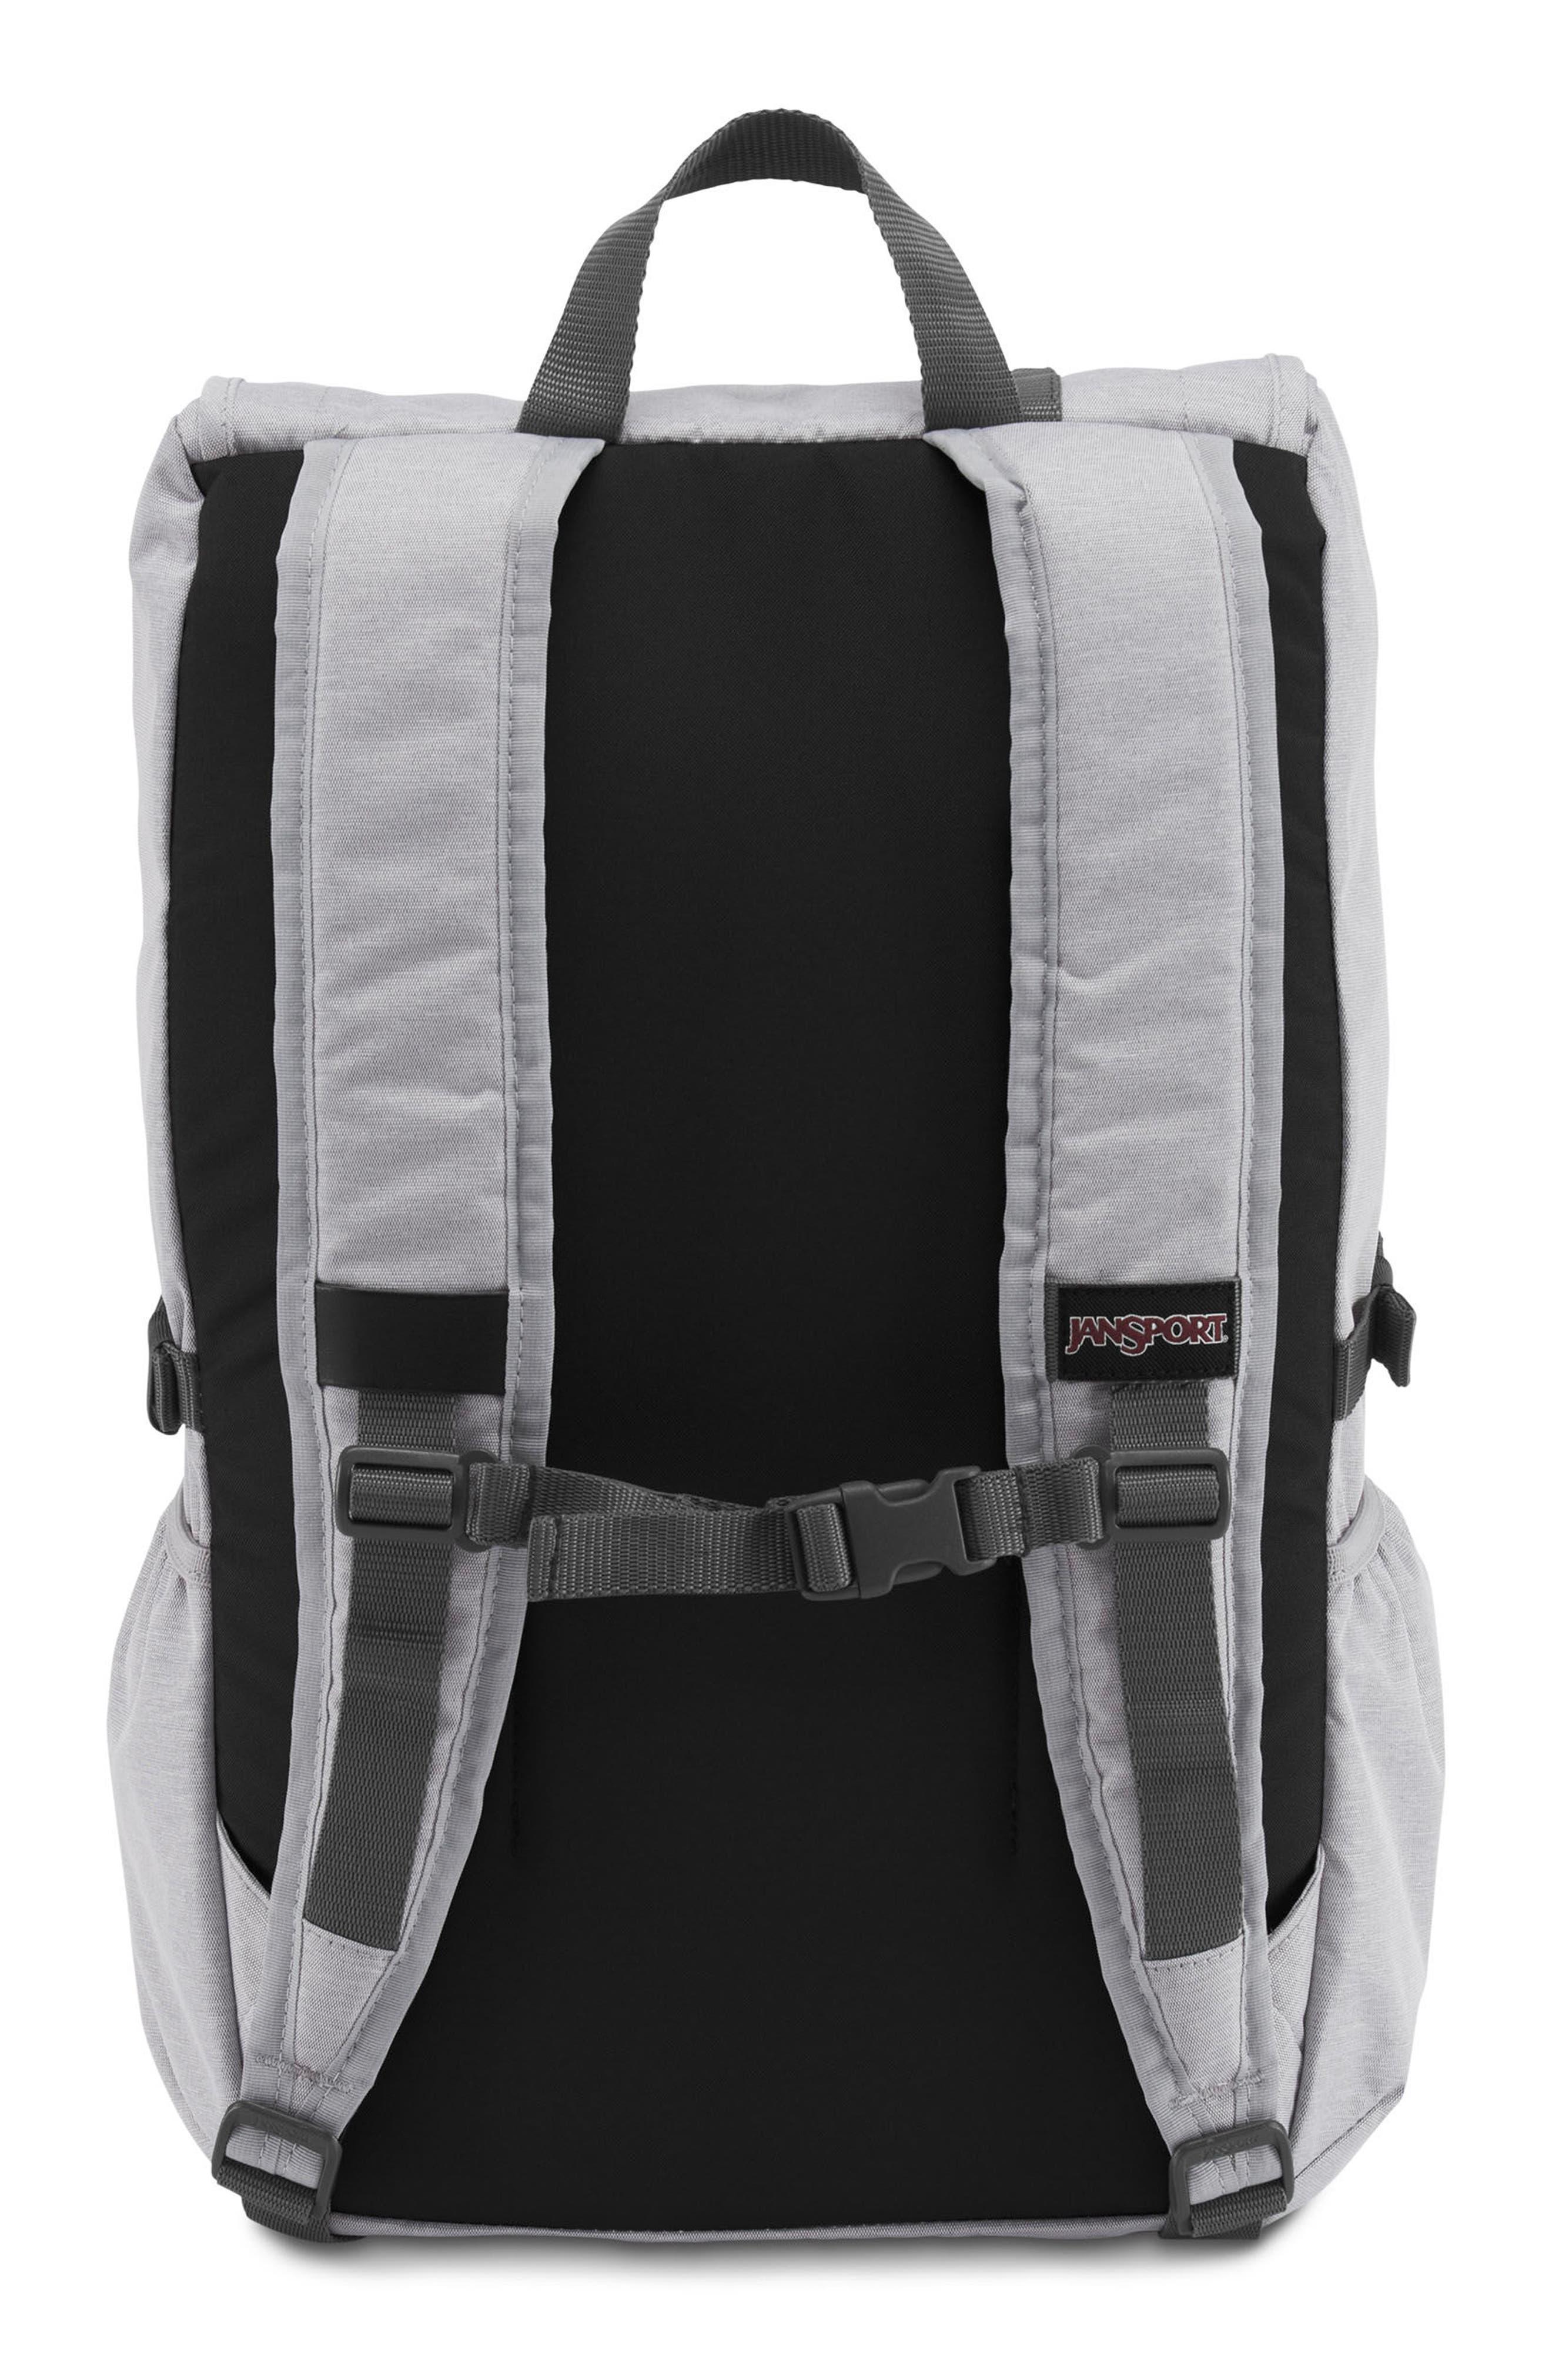 Hatchet Backpack,                             Alternate thumbnail 3, color,                             090